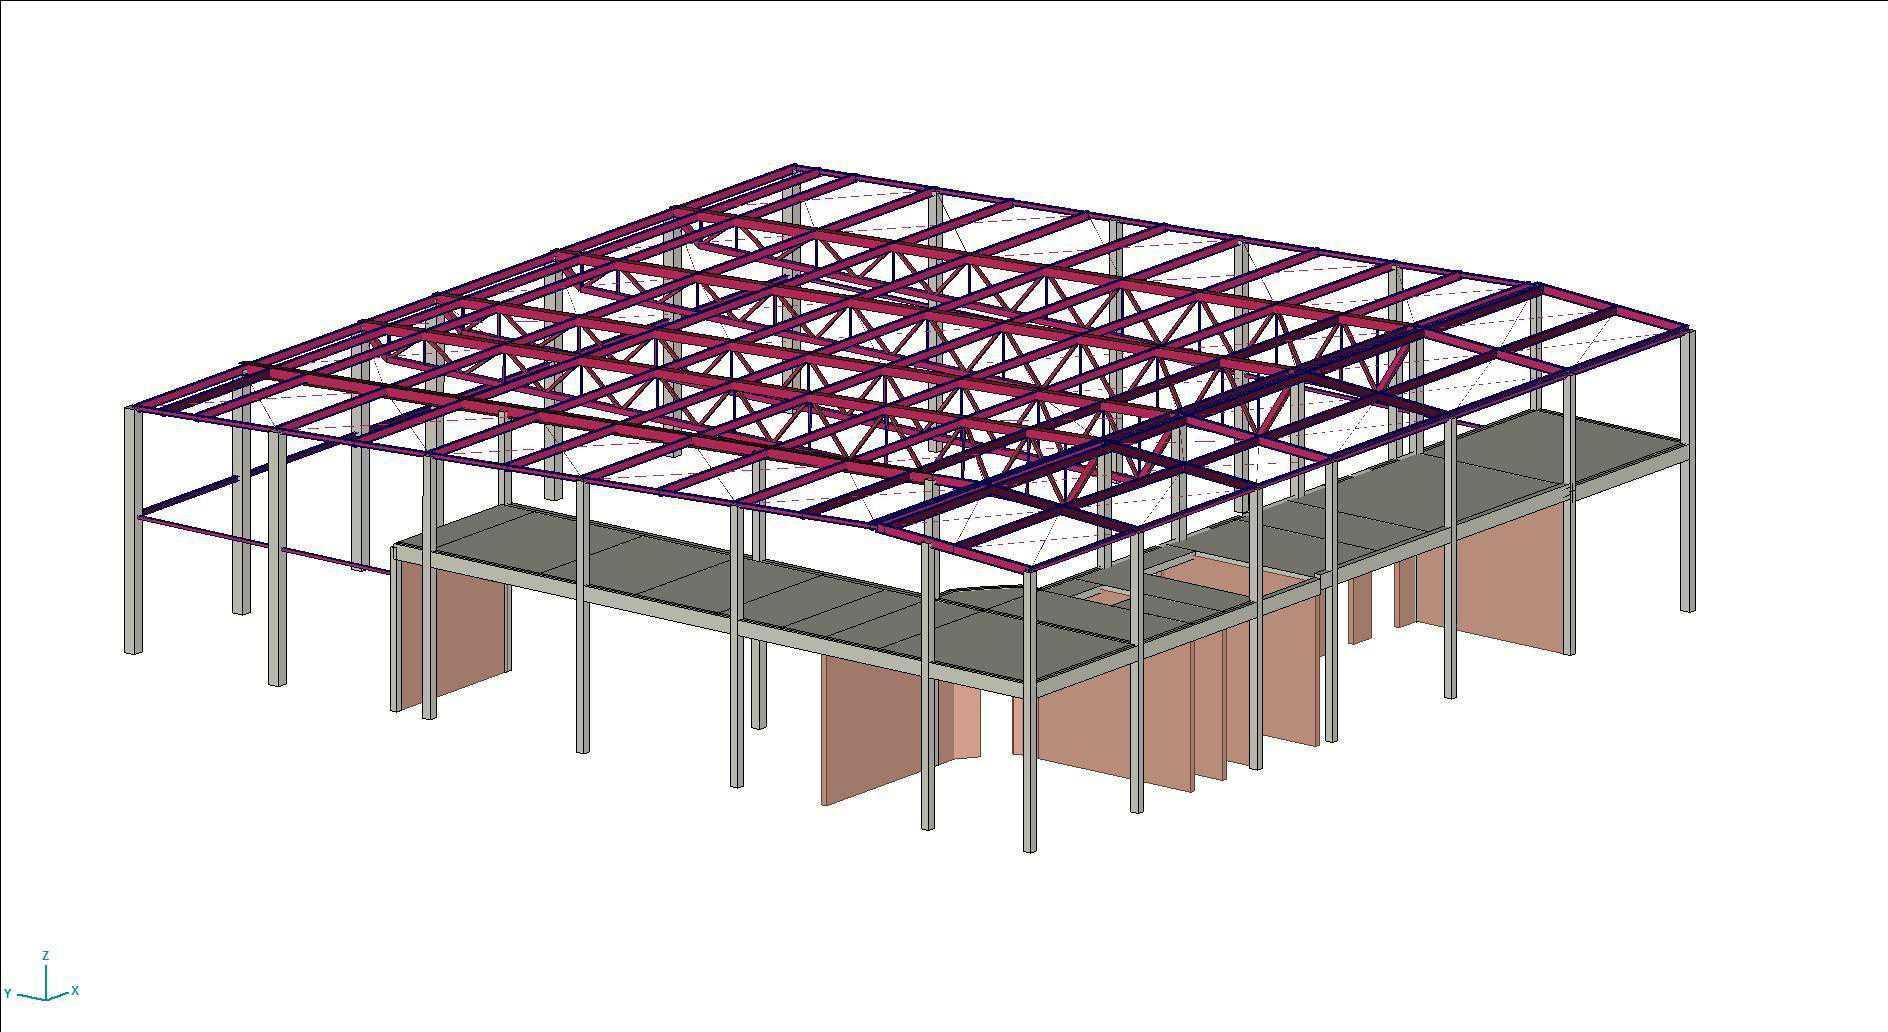 konstrukcja projektu